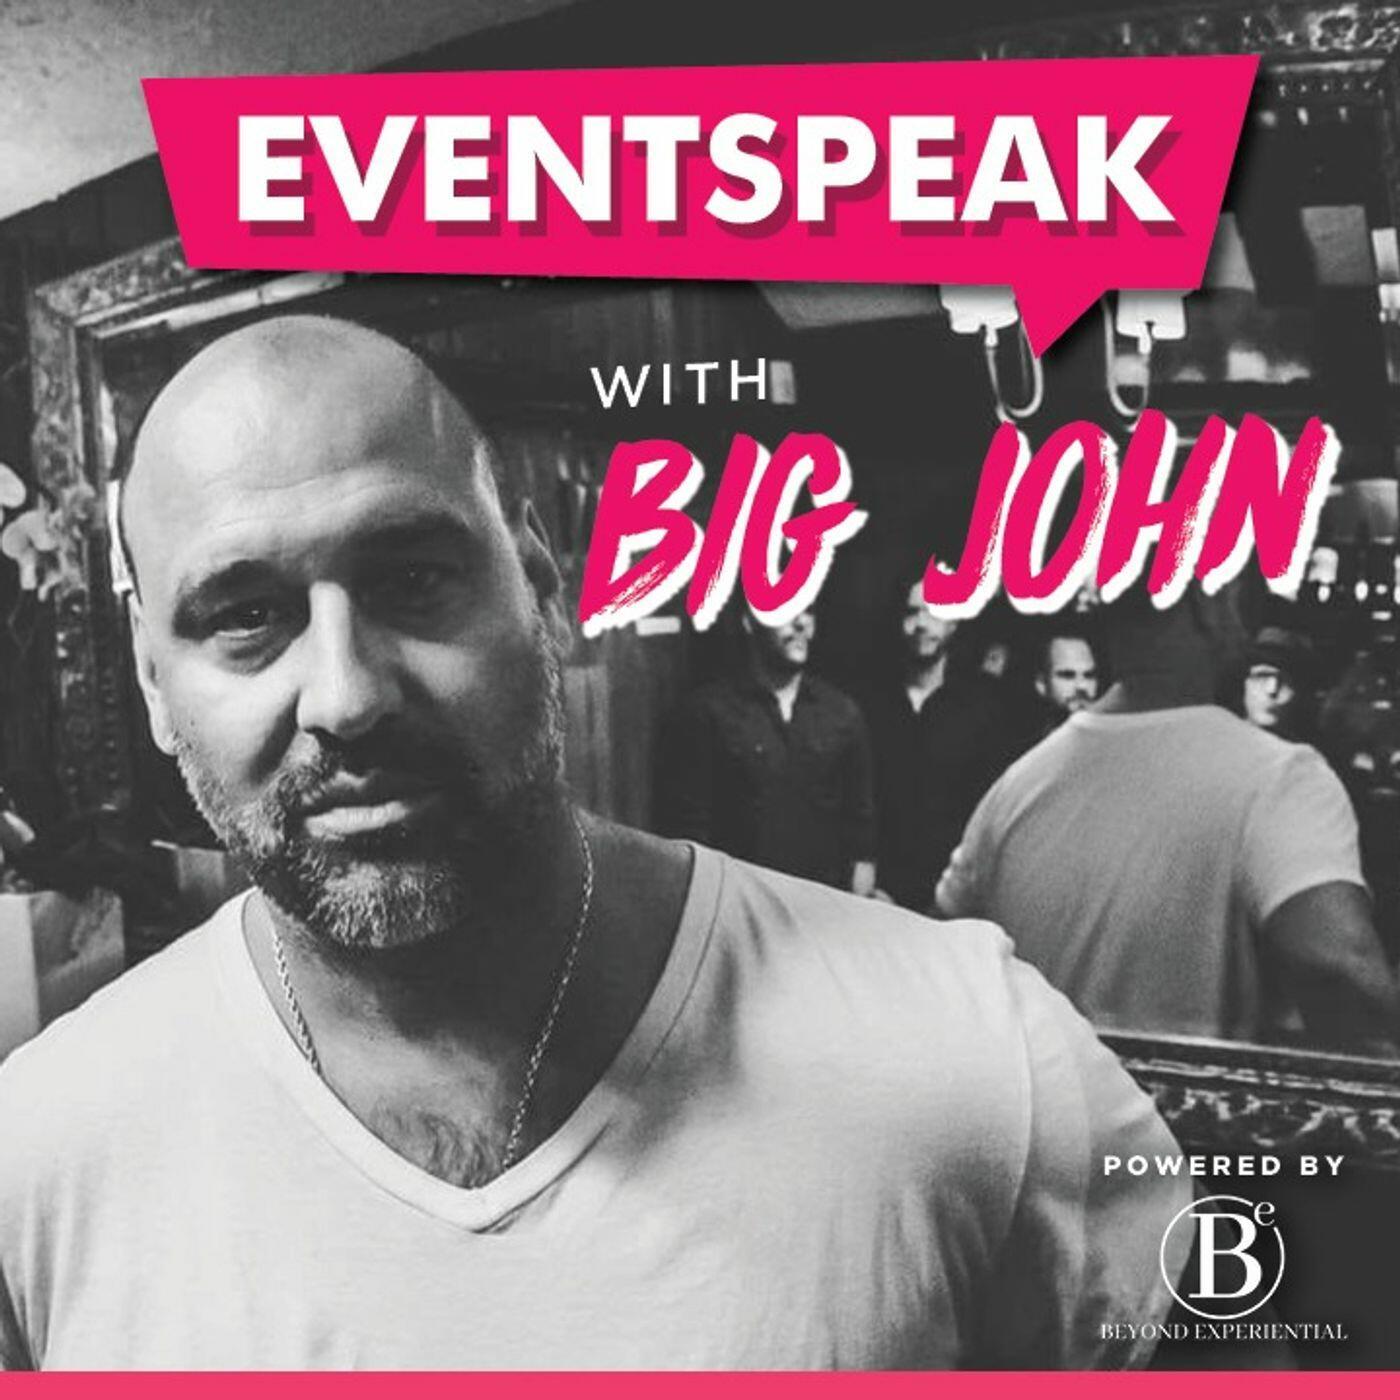 EventSpeak with Big John